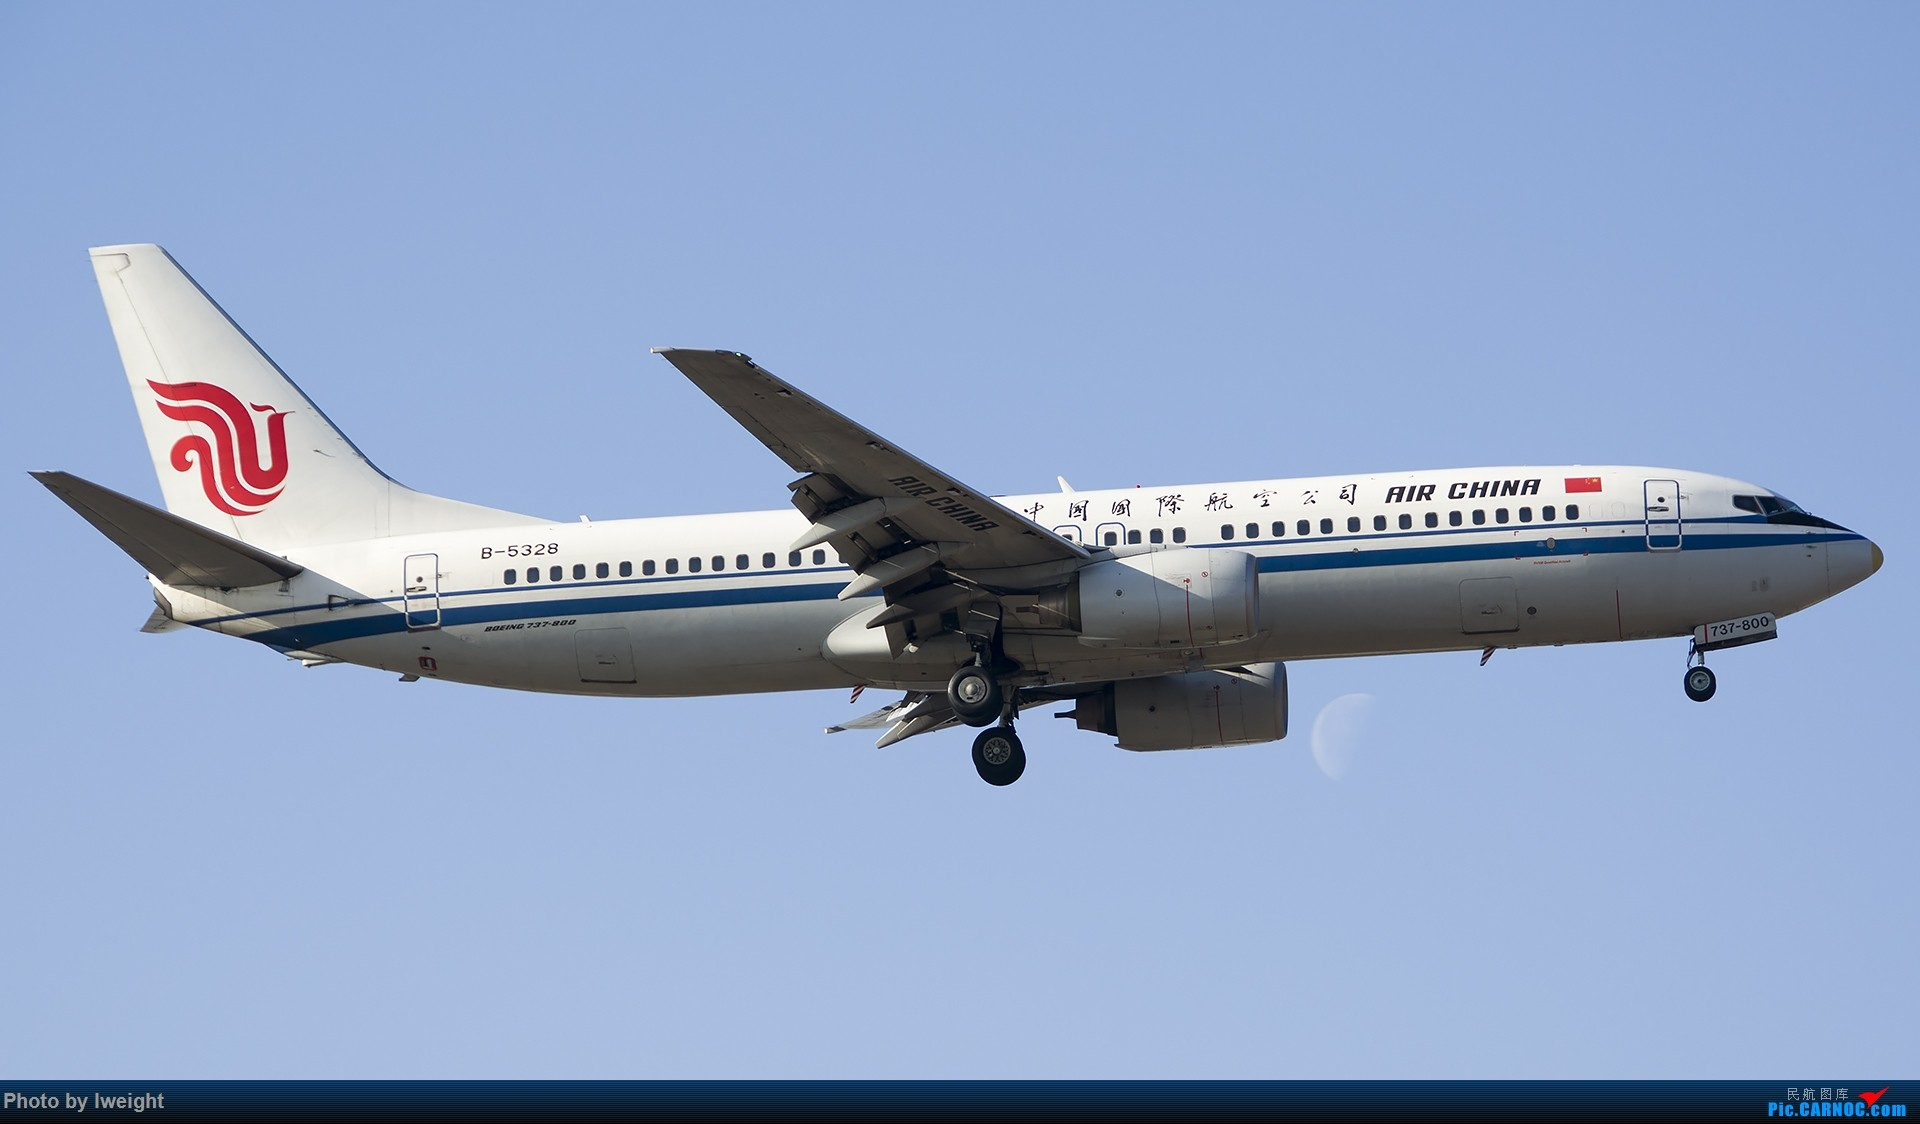 Re:[原创]庆祝升级777,发上今天在首都机场拍的所有飞机【2014-12-14】 BOEING 737-800 B-5328 中国北京首都国际机场